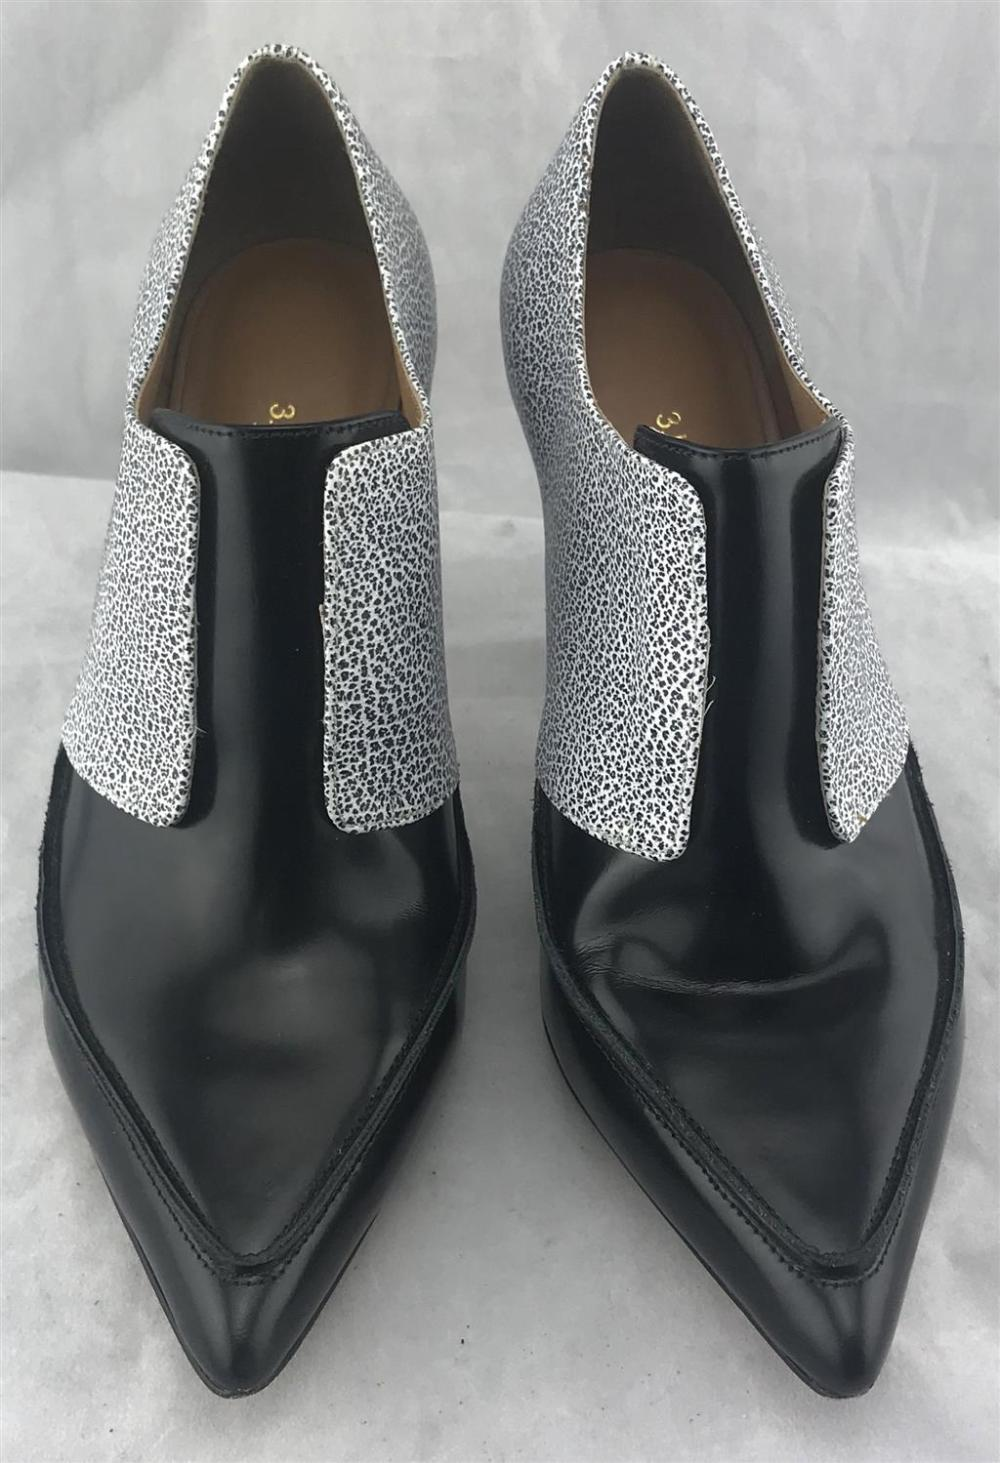 Phillip Lim: Black & White Textured Stiletto Pumps,